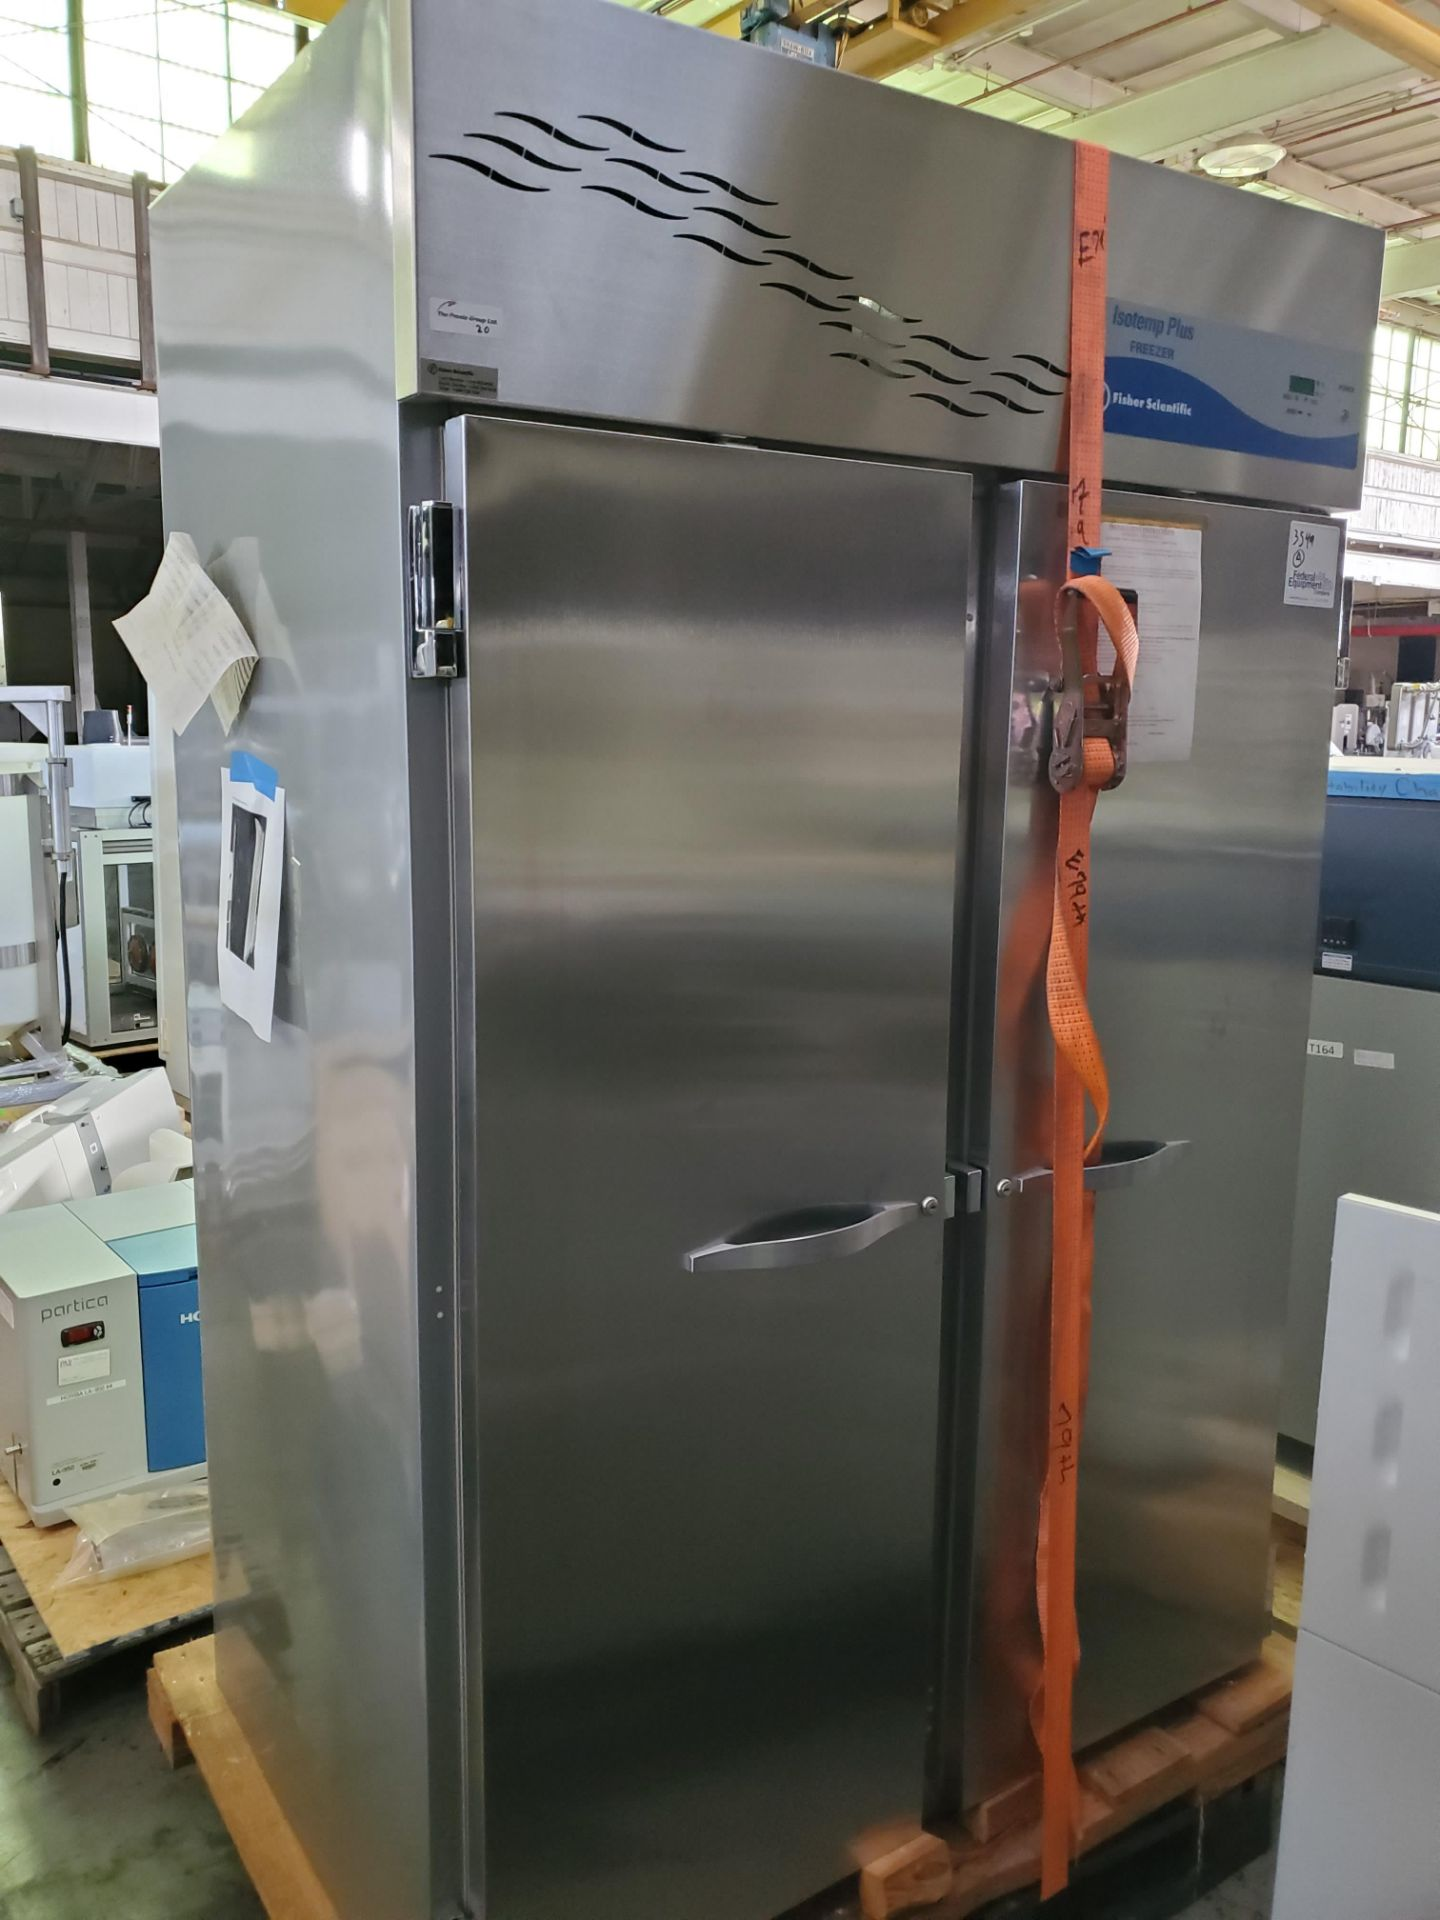 "Lot 20 - Fisher Scientific Isotemp Plus Freezer, 48"" wide x 25""deep x 60"" high chamber"